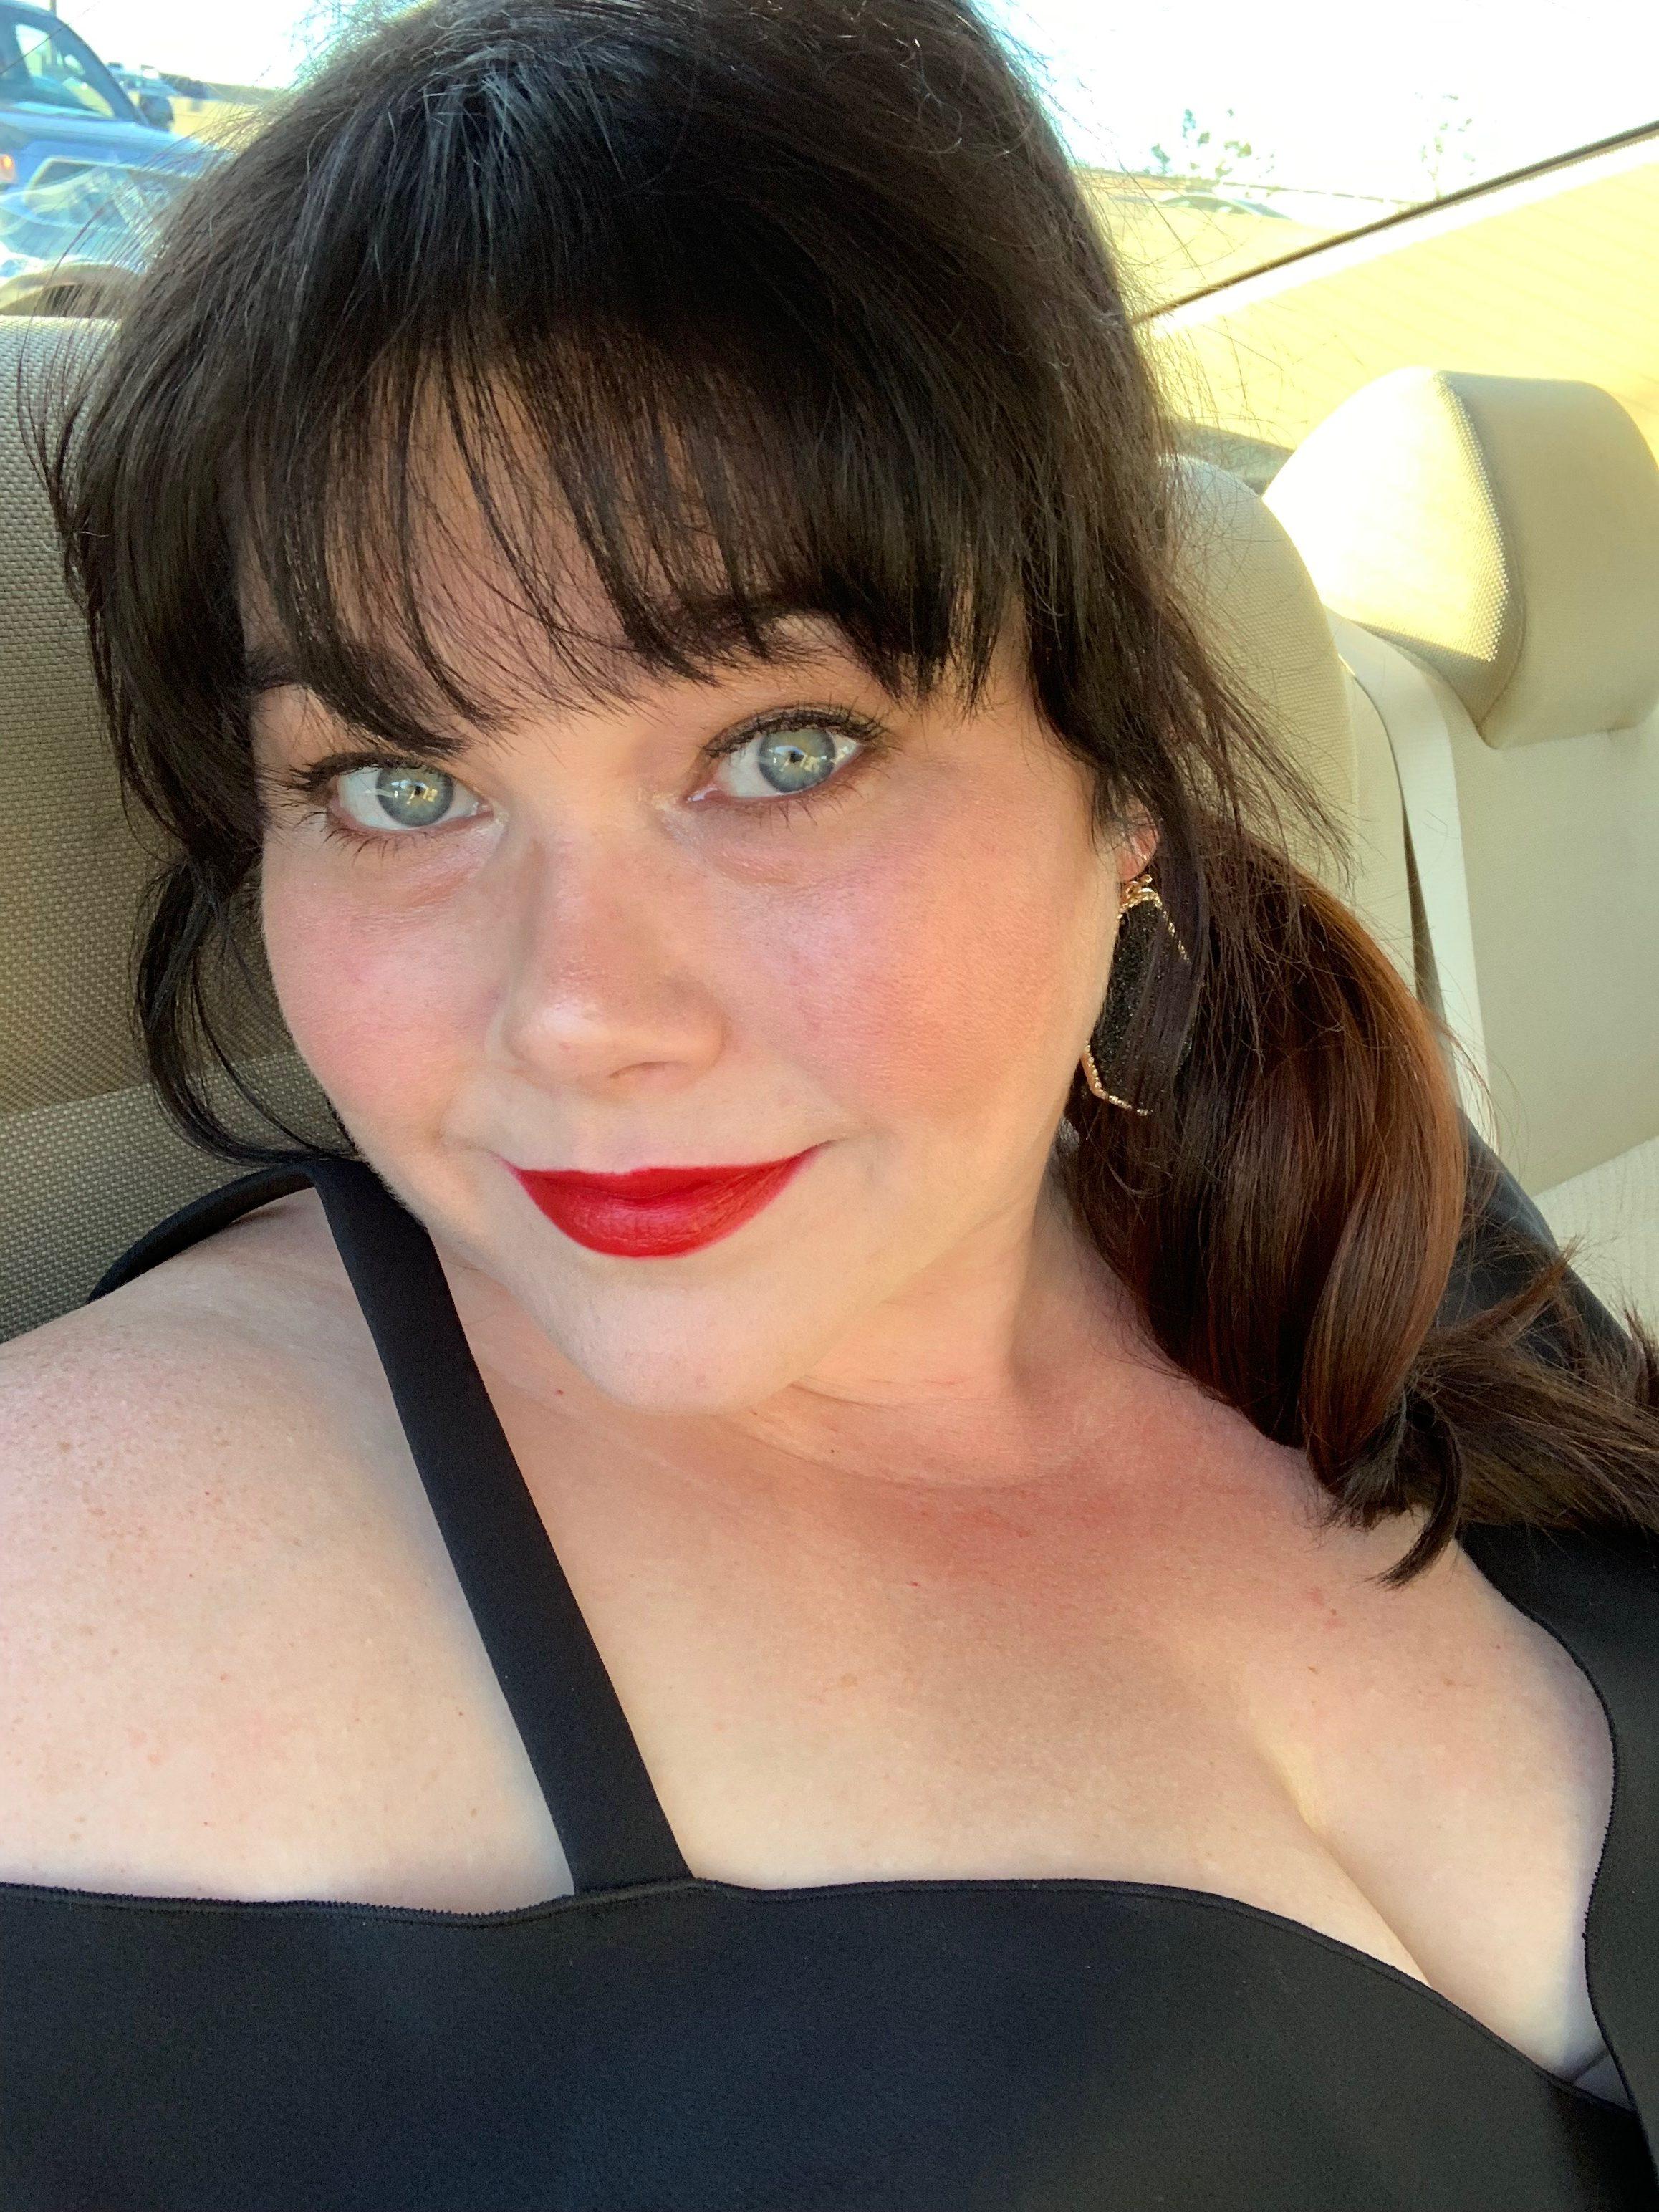 Beauty Break: Mermaid Facial at Elina Organics Spa in Chicago